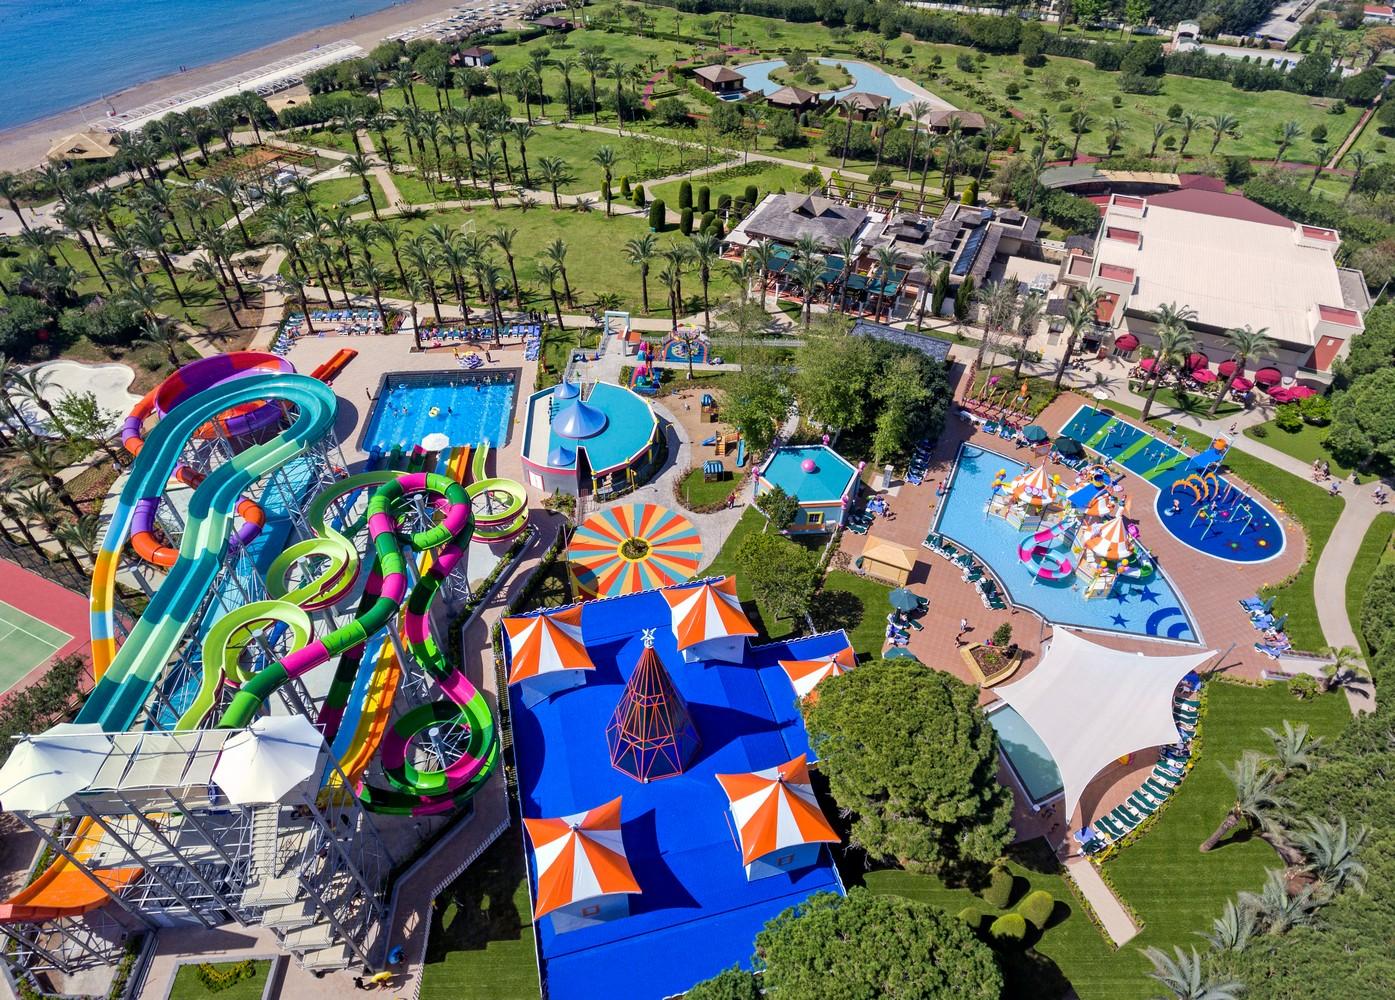 ic_hotels_green_palace_aquapark_4.jpg